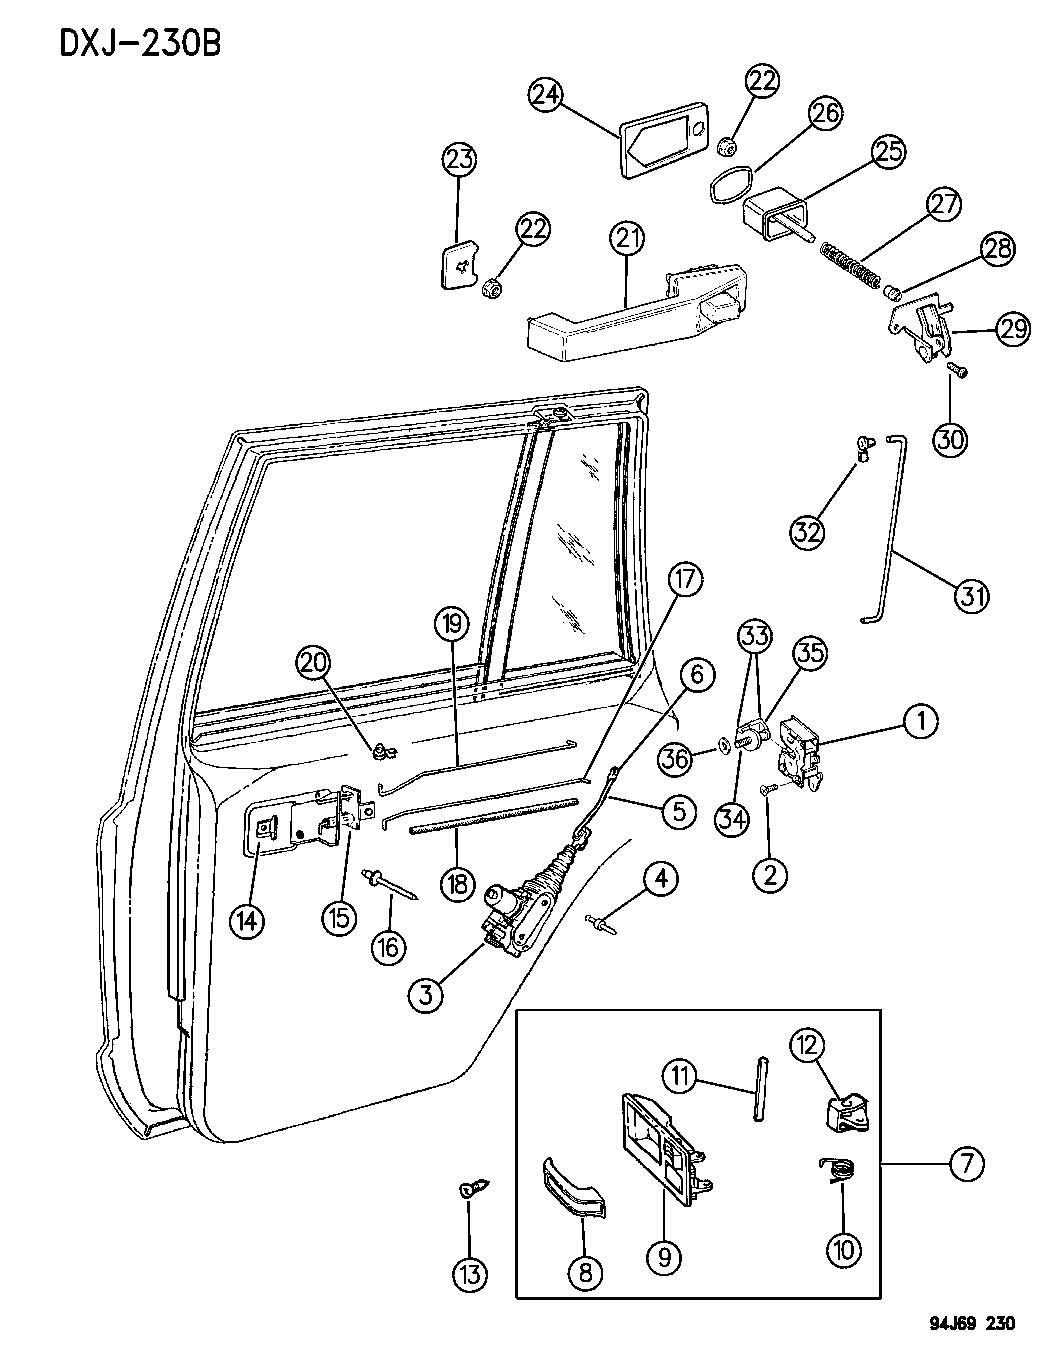 rg2ex1 wiring diagram